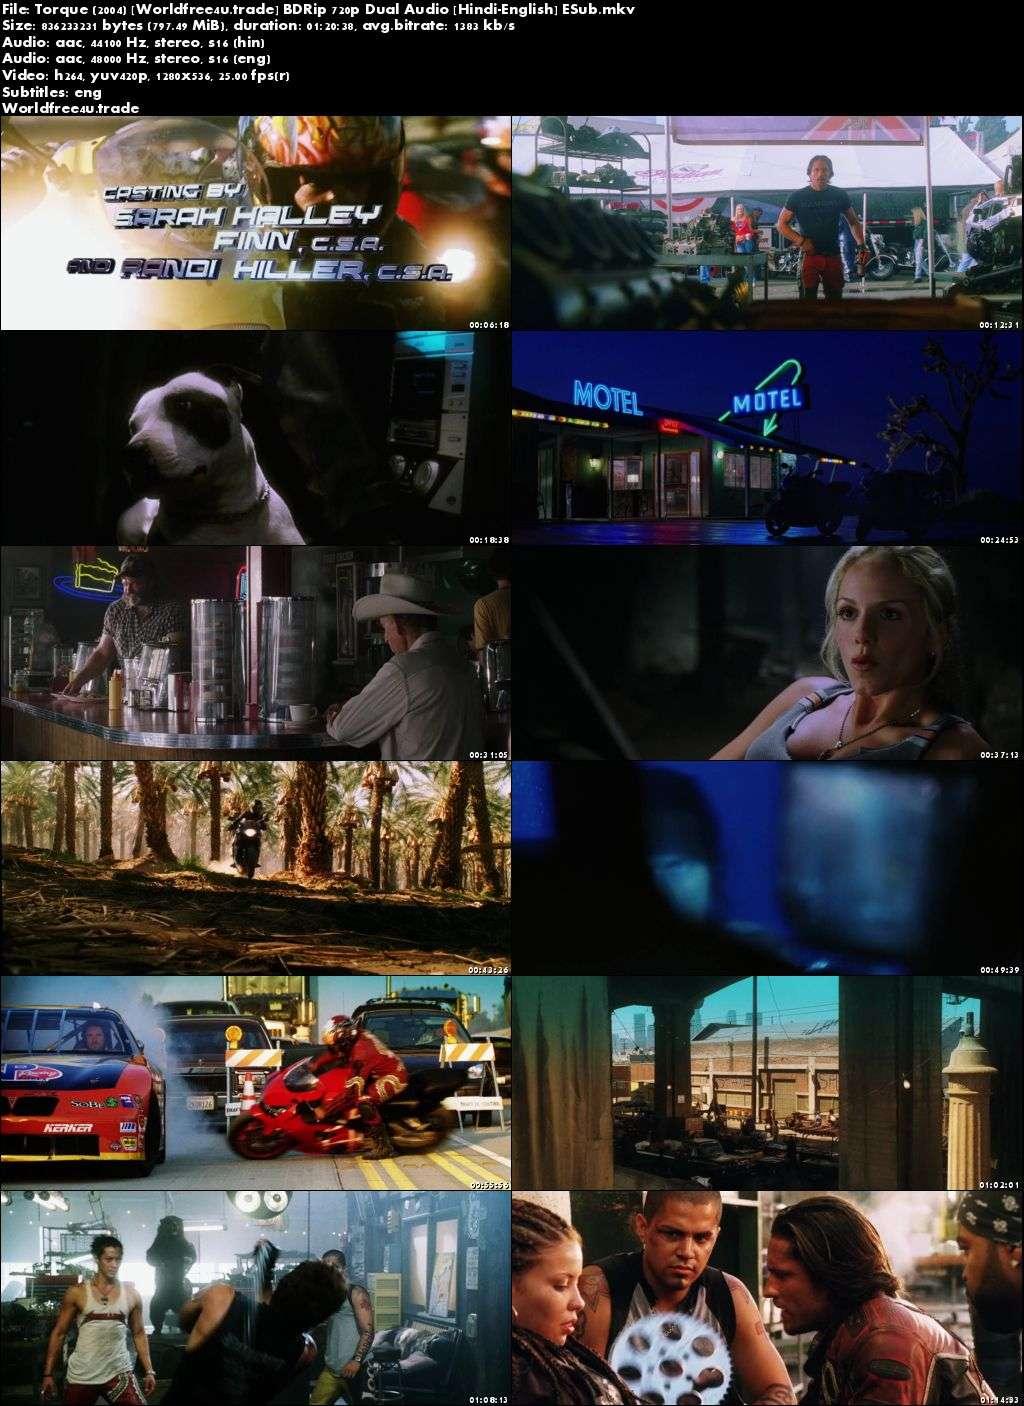 Screen Shots Torque 2004 Full HD Movie Download Dual Audio Hindi 720p